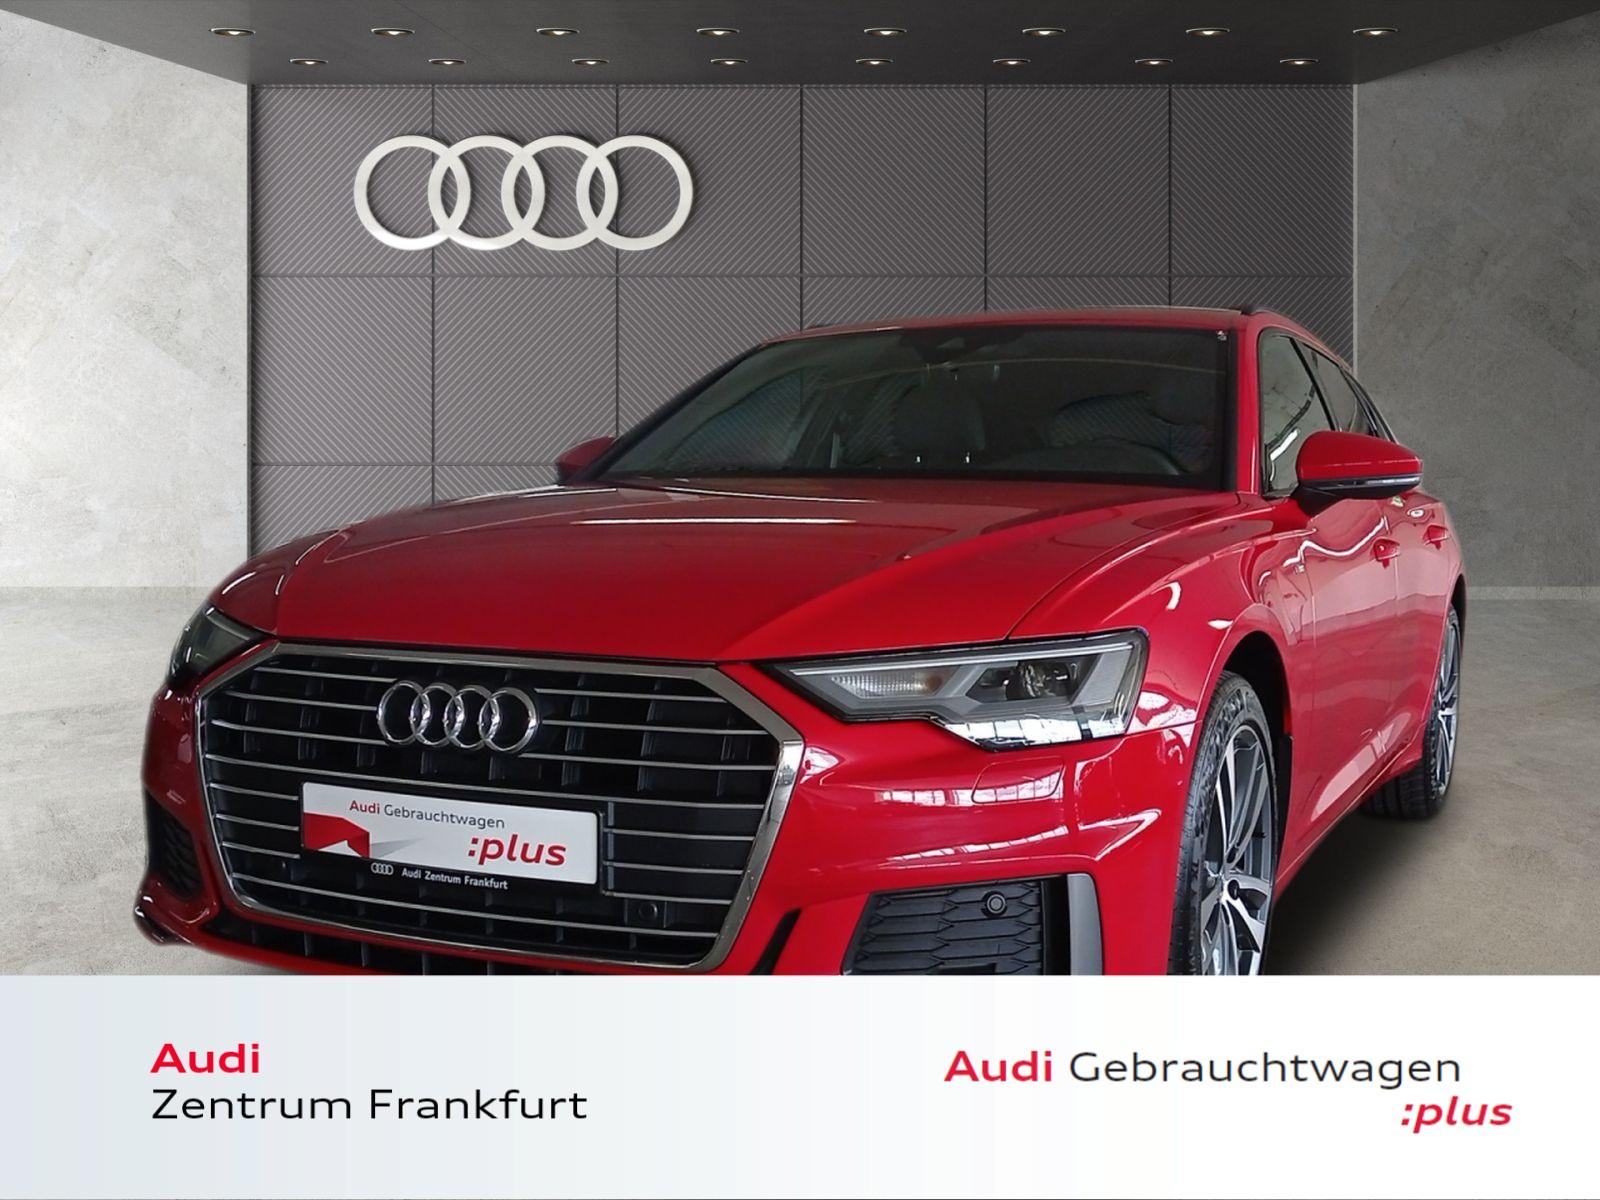 Audi A6 Avant 40 TDI S tronic S line Navi LED Tempomat, Jahr 2019, Diesel